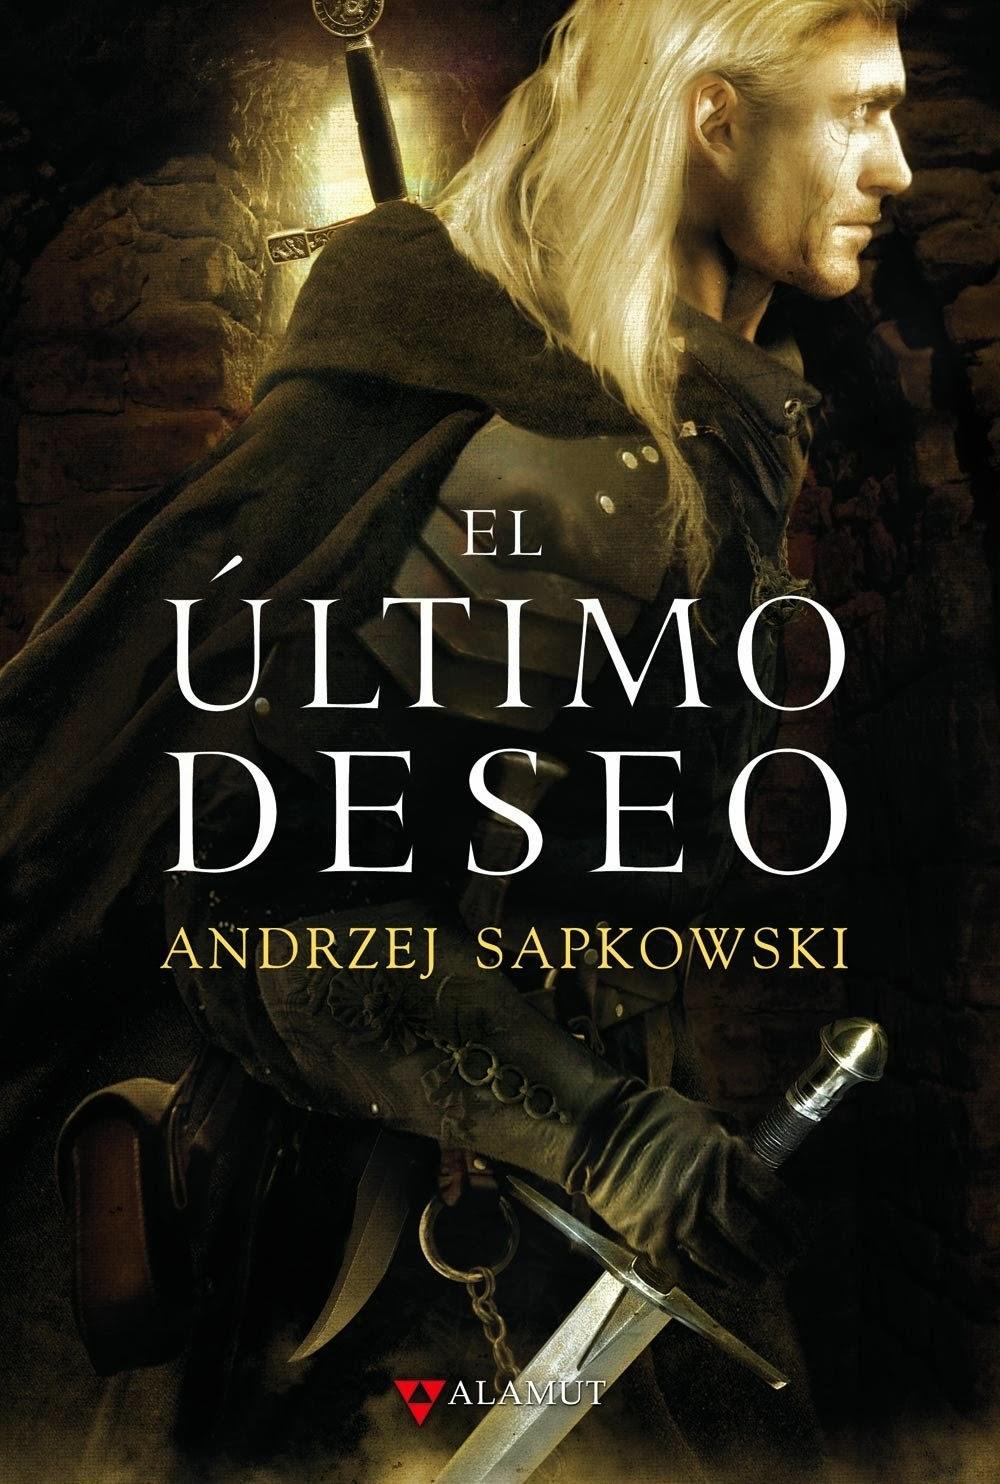 https://labibliotecadebella.blogspot.com.es/2016/05/el-ultimo-deseo-andrzej-sapkowski.html